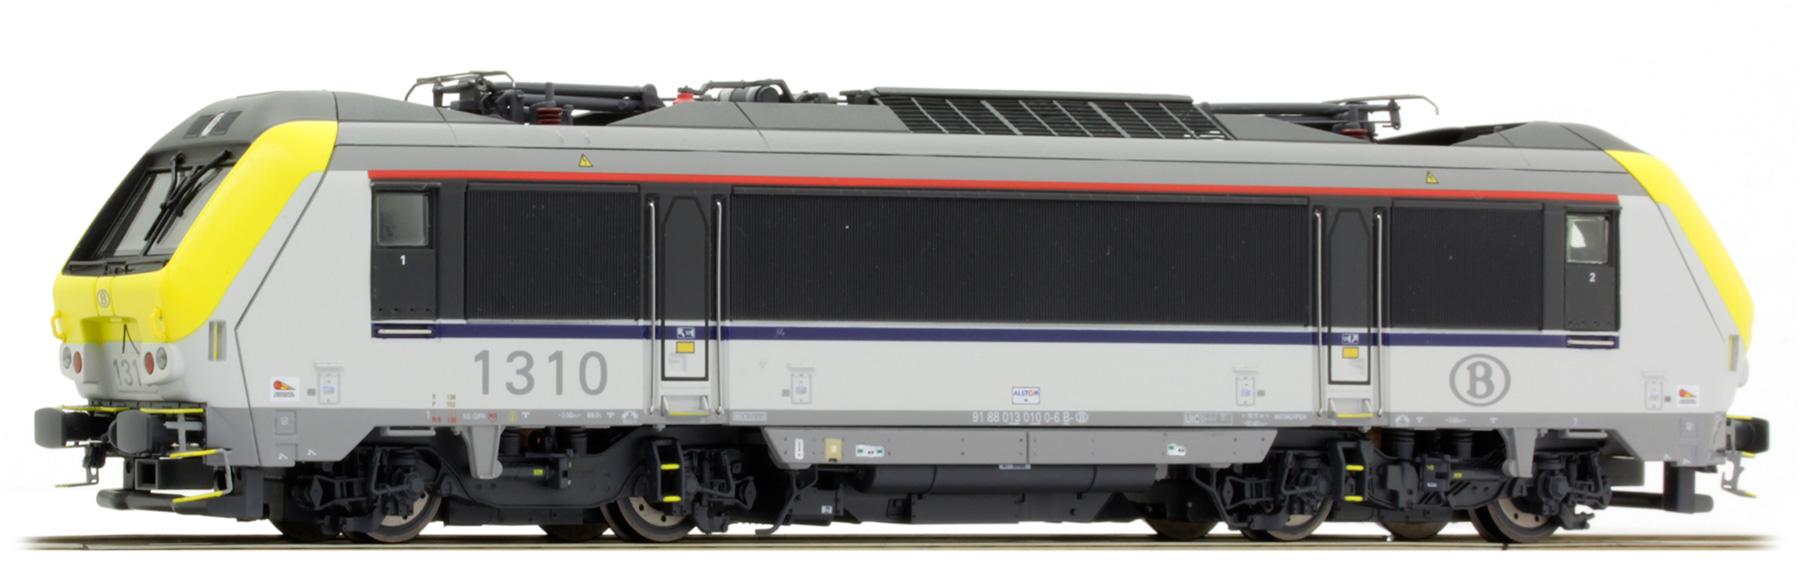 LS+Models 12016 Baureihe 1310 modellbahnshop-lippe.com